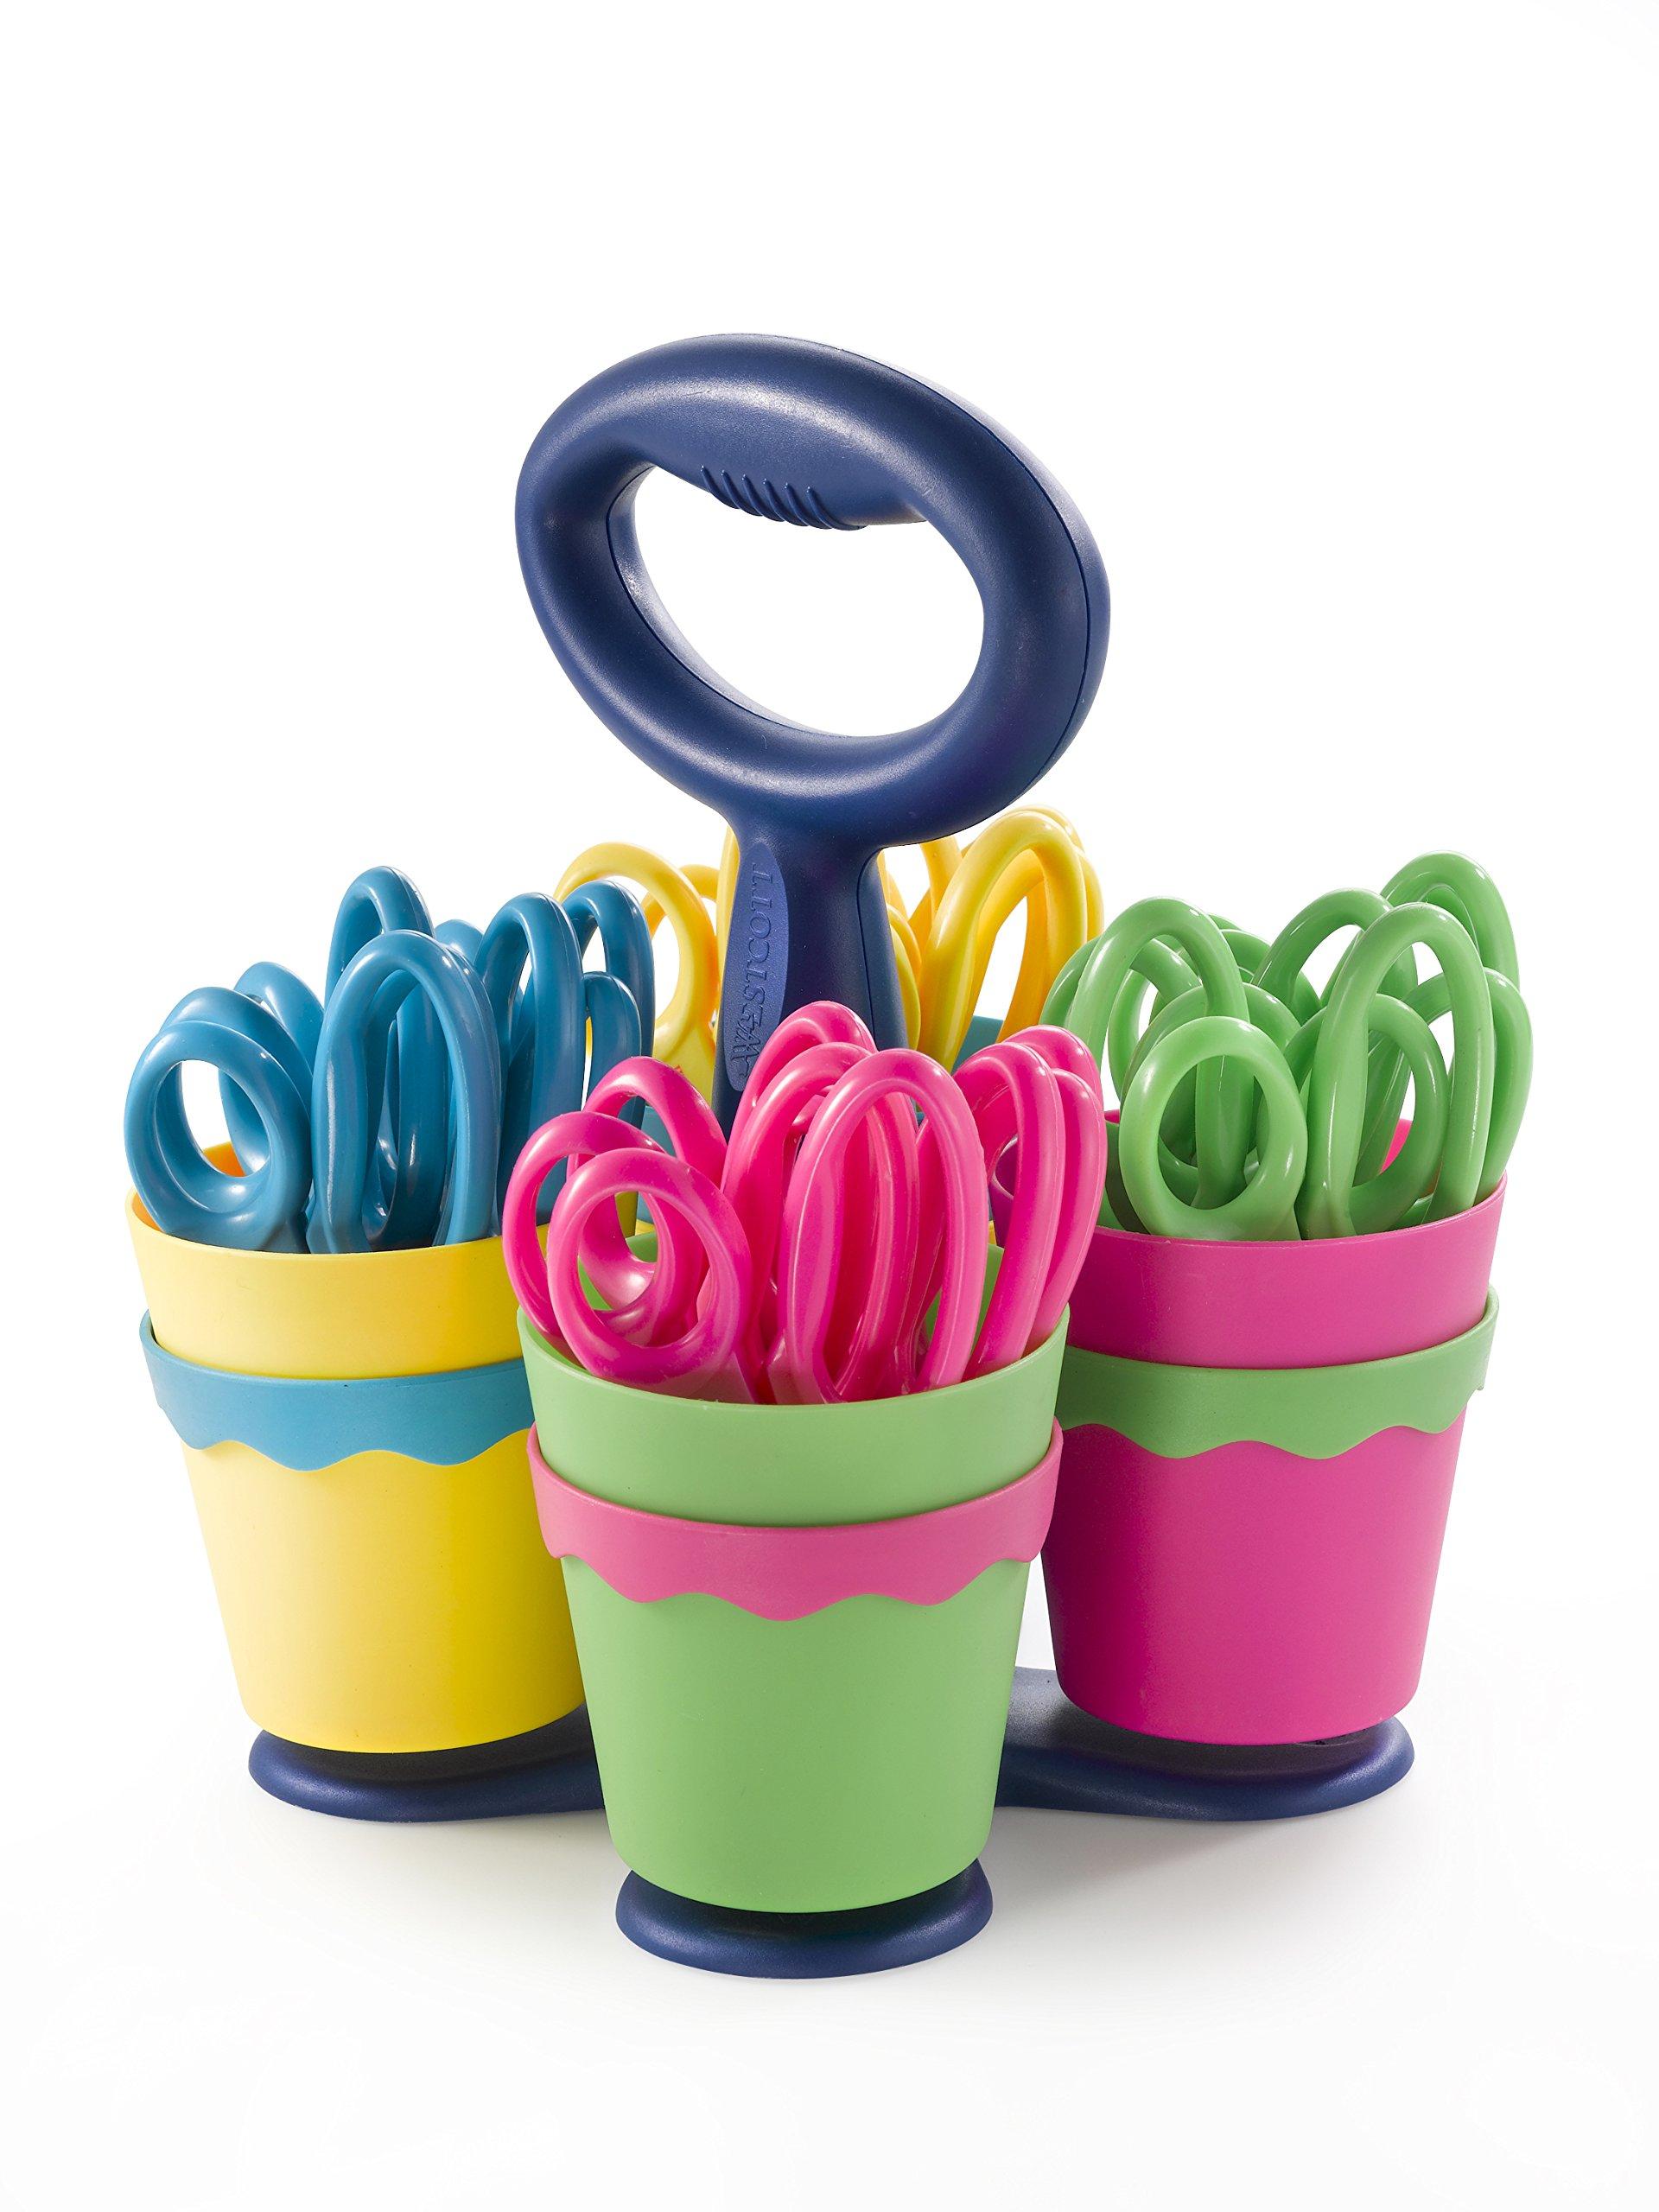 Scissor Caddy with 24 pieces 5'' Kids Pointed Scissors with Anti-Microbial (#14607) by Westcott